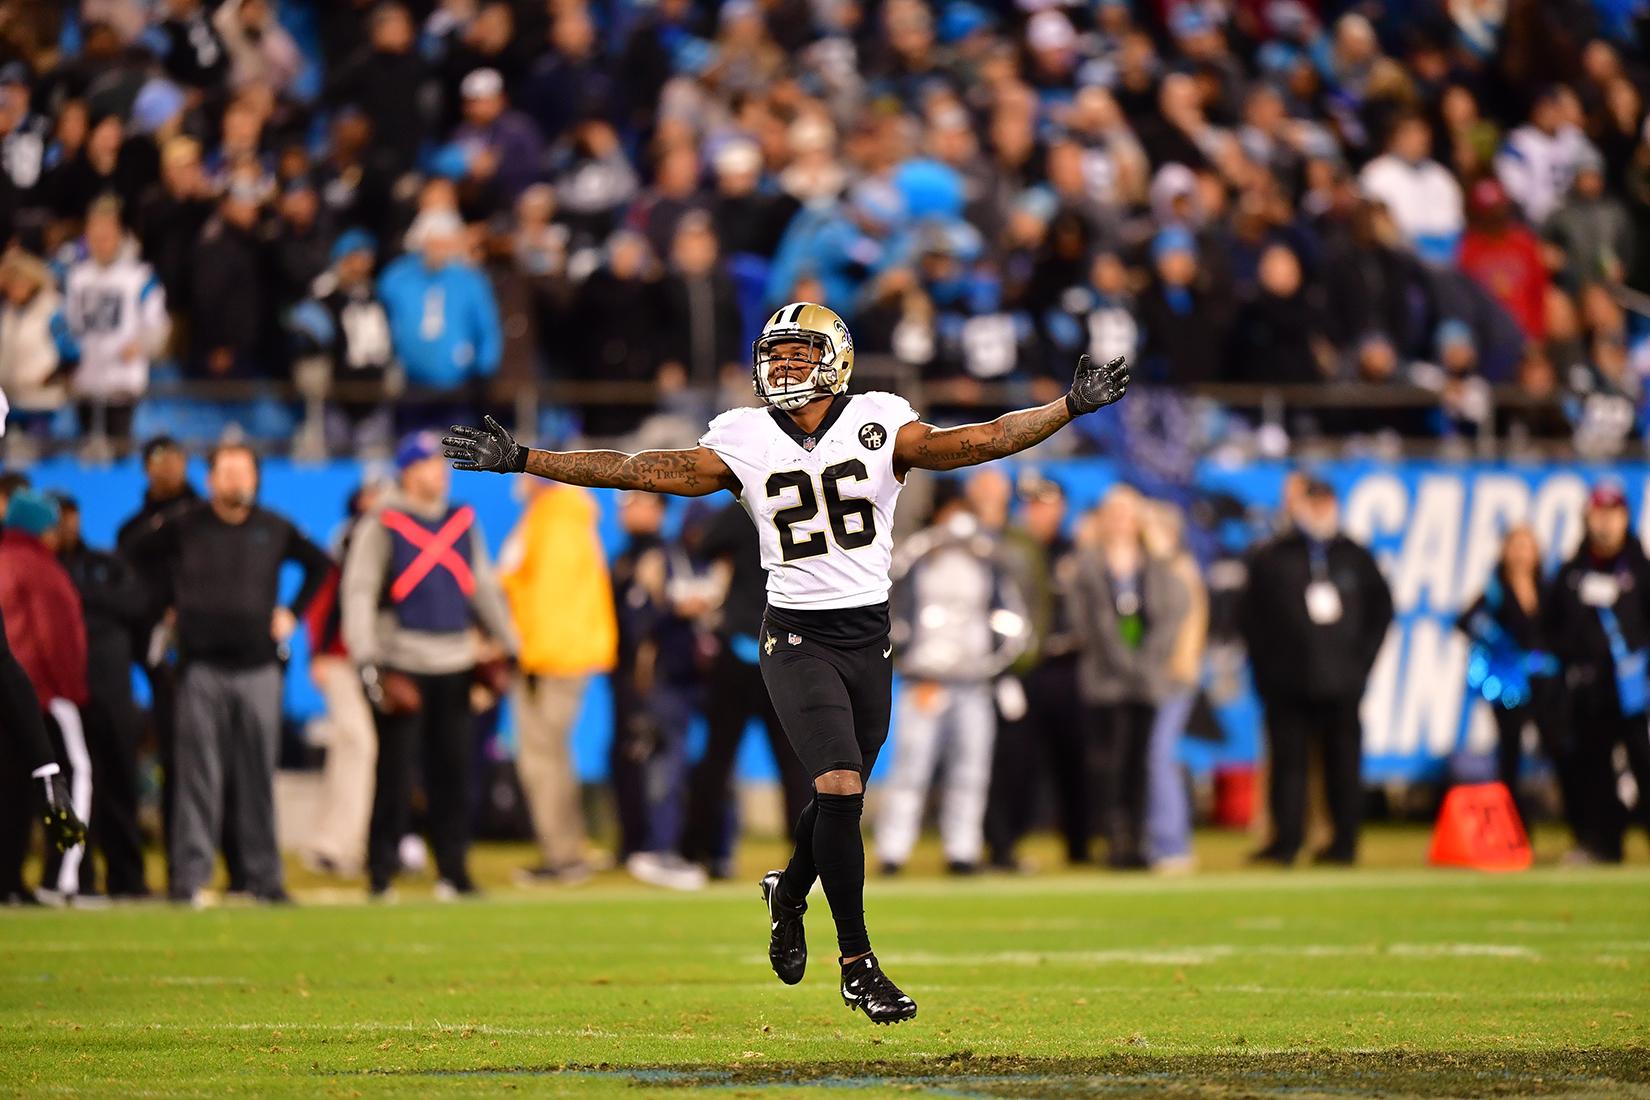 534edc34 Monday Night Football Ratings Hit Week 15 High - Sports Media Watch